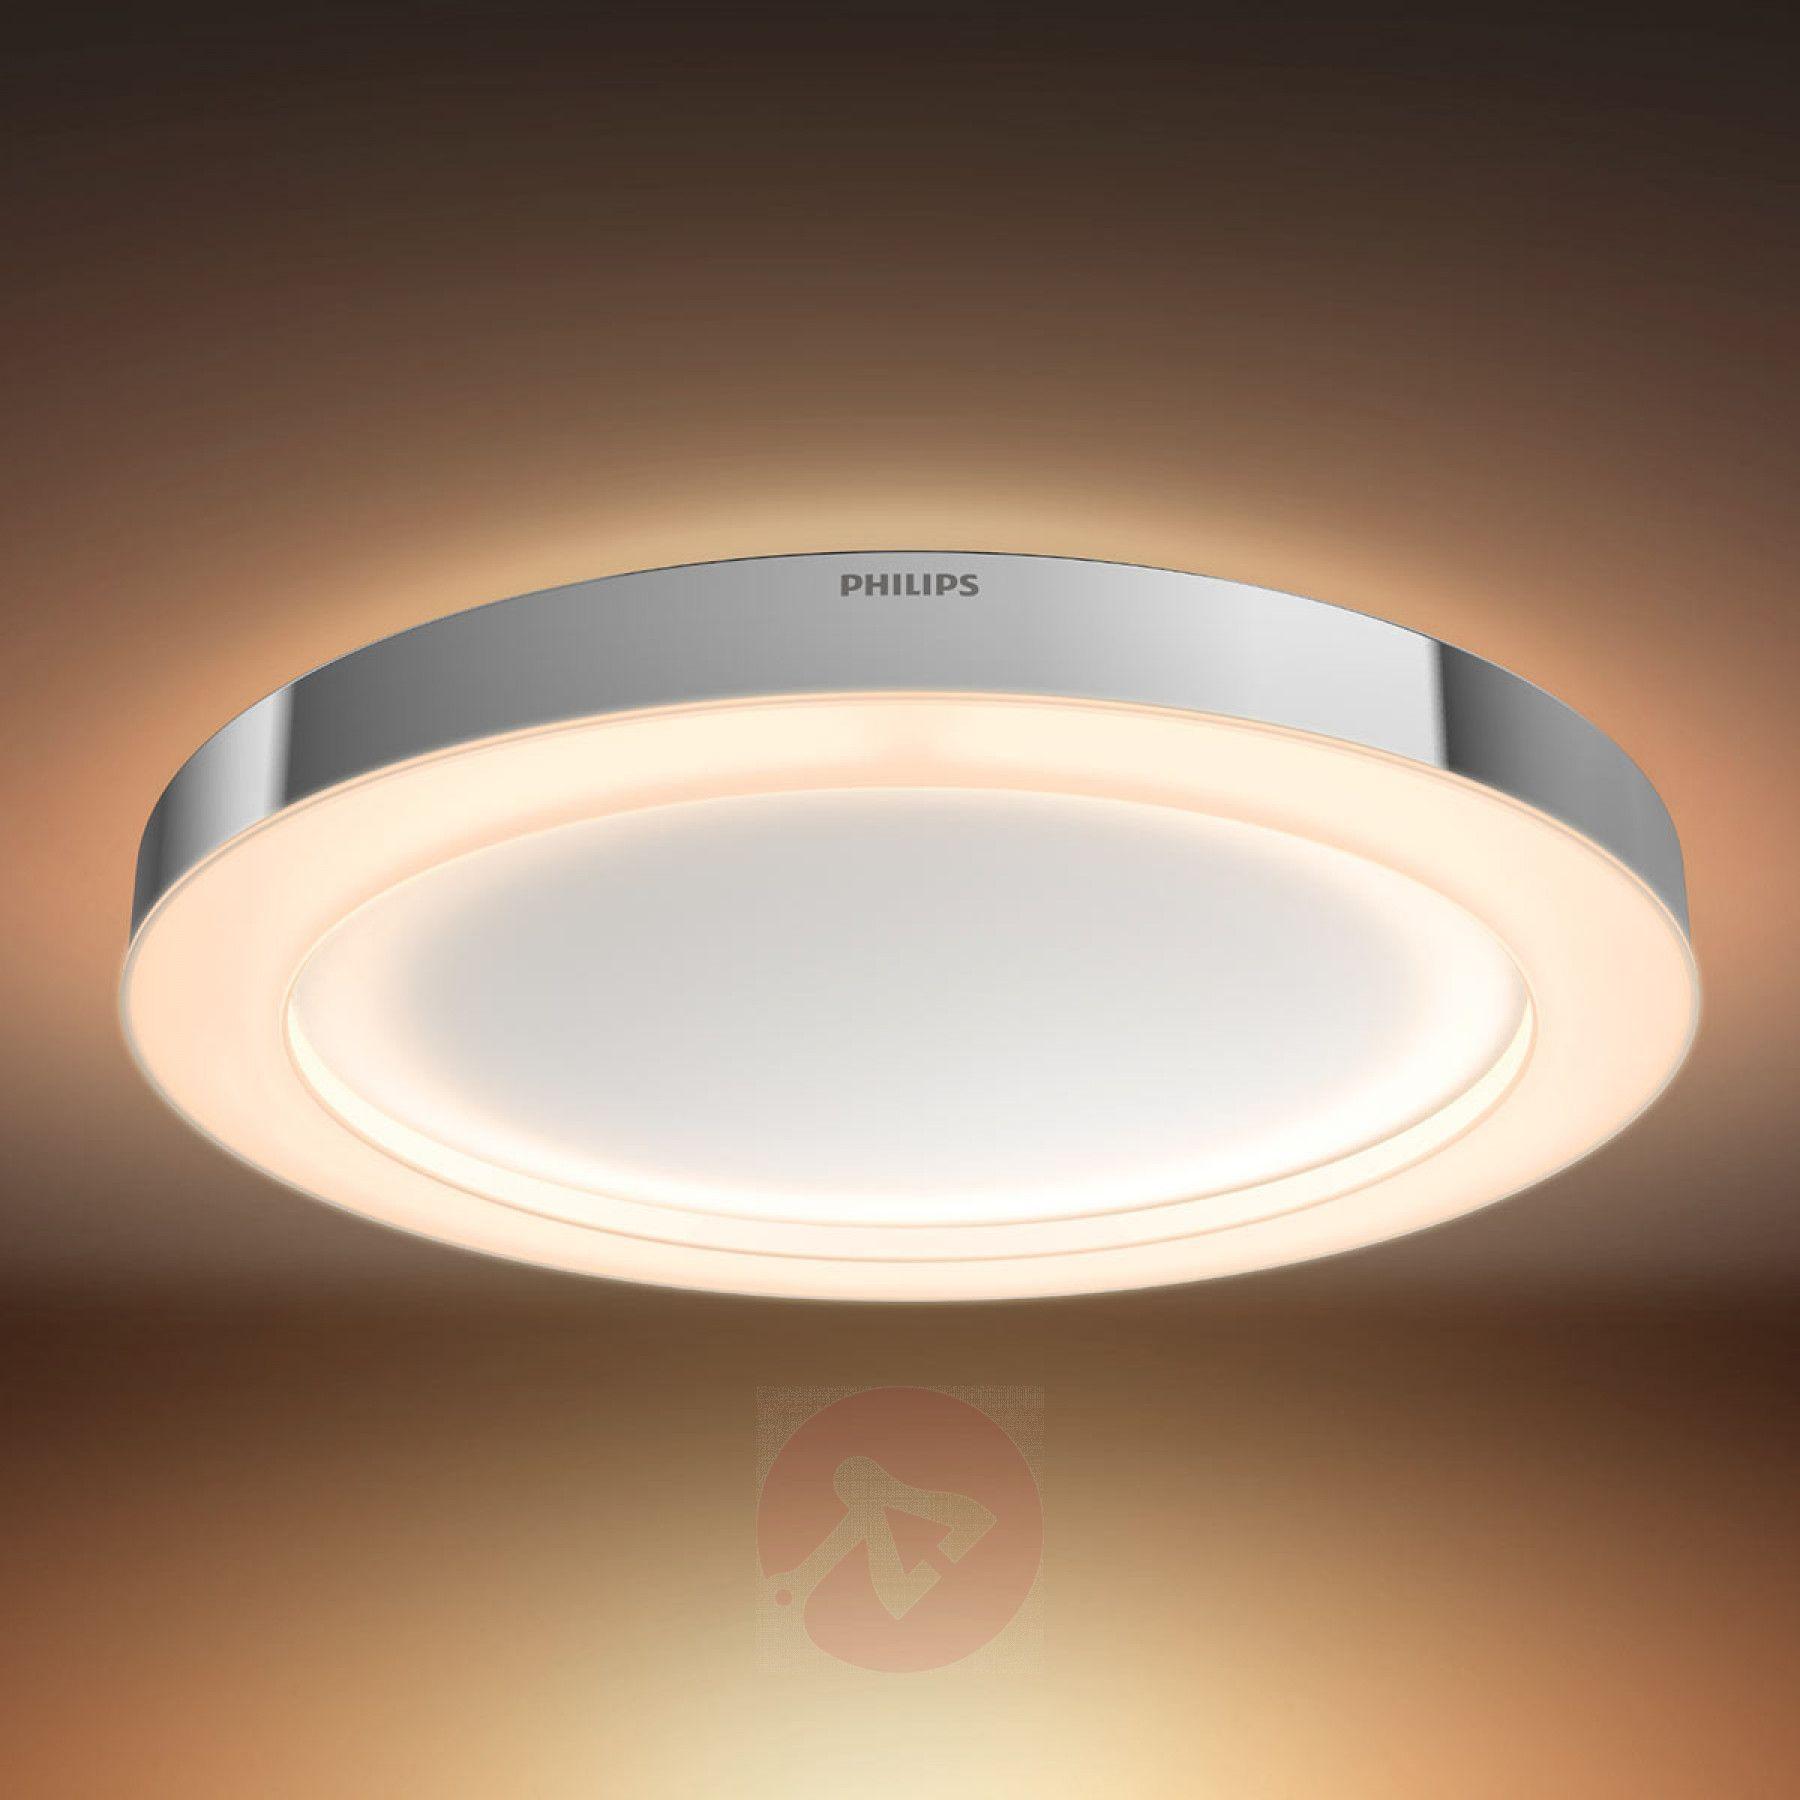 Philips Hue White Ambiance Adore Bad Deckenlampe Beleuchtung Decke Deckenlampe Beleuchtung Wohnzimmer